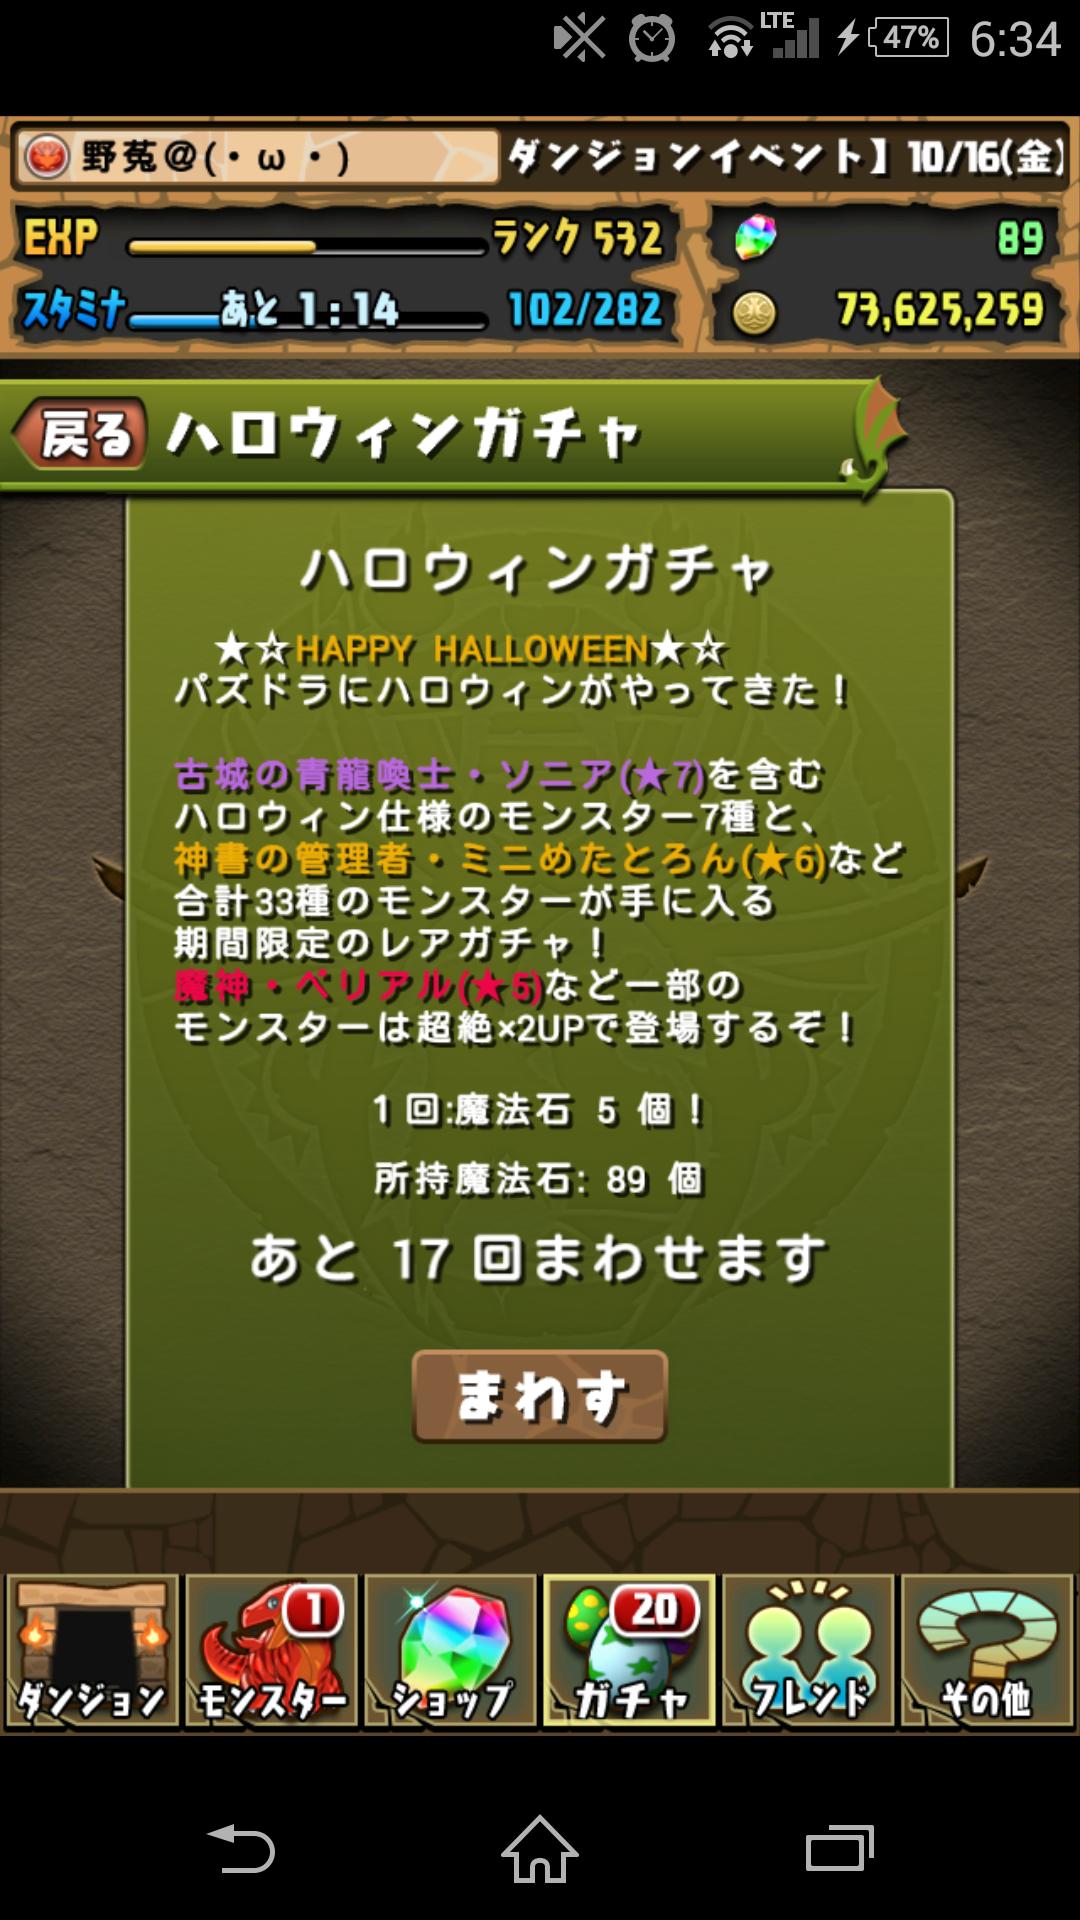 Screenshot_2015-10-22-18-34-57.png